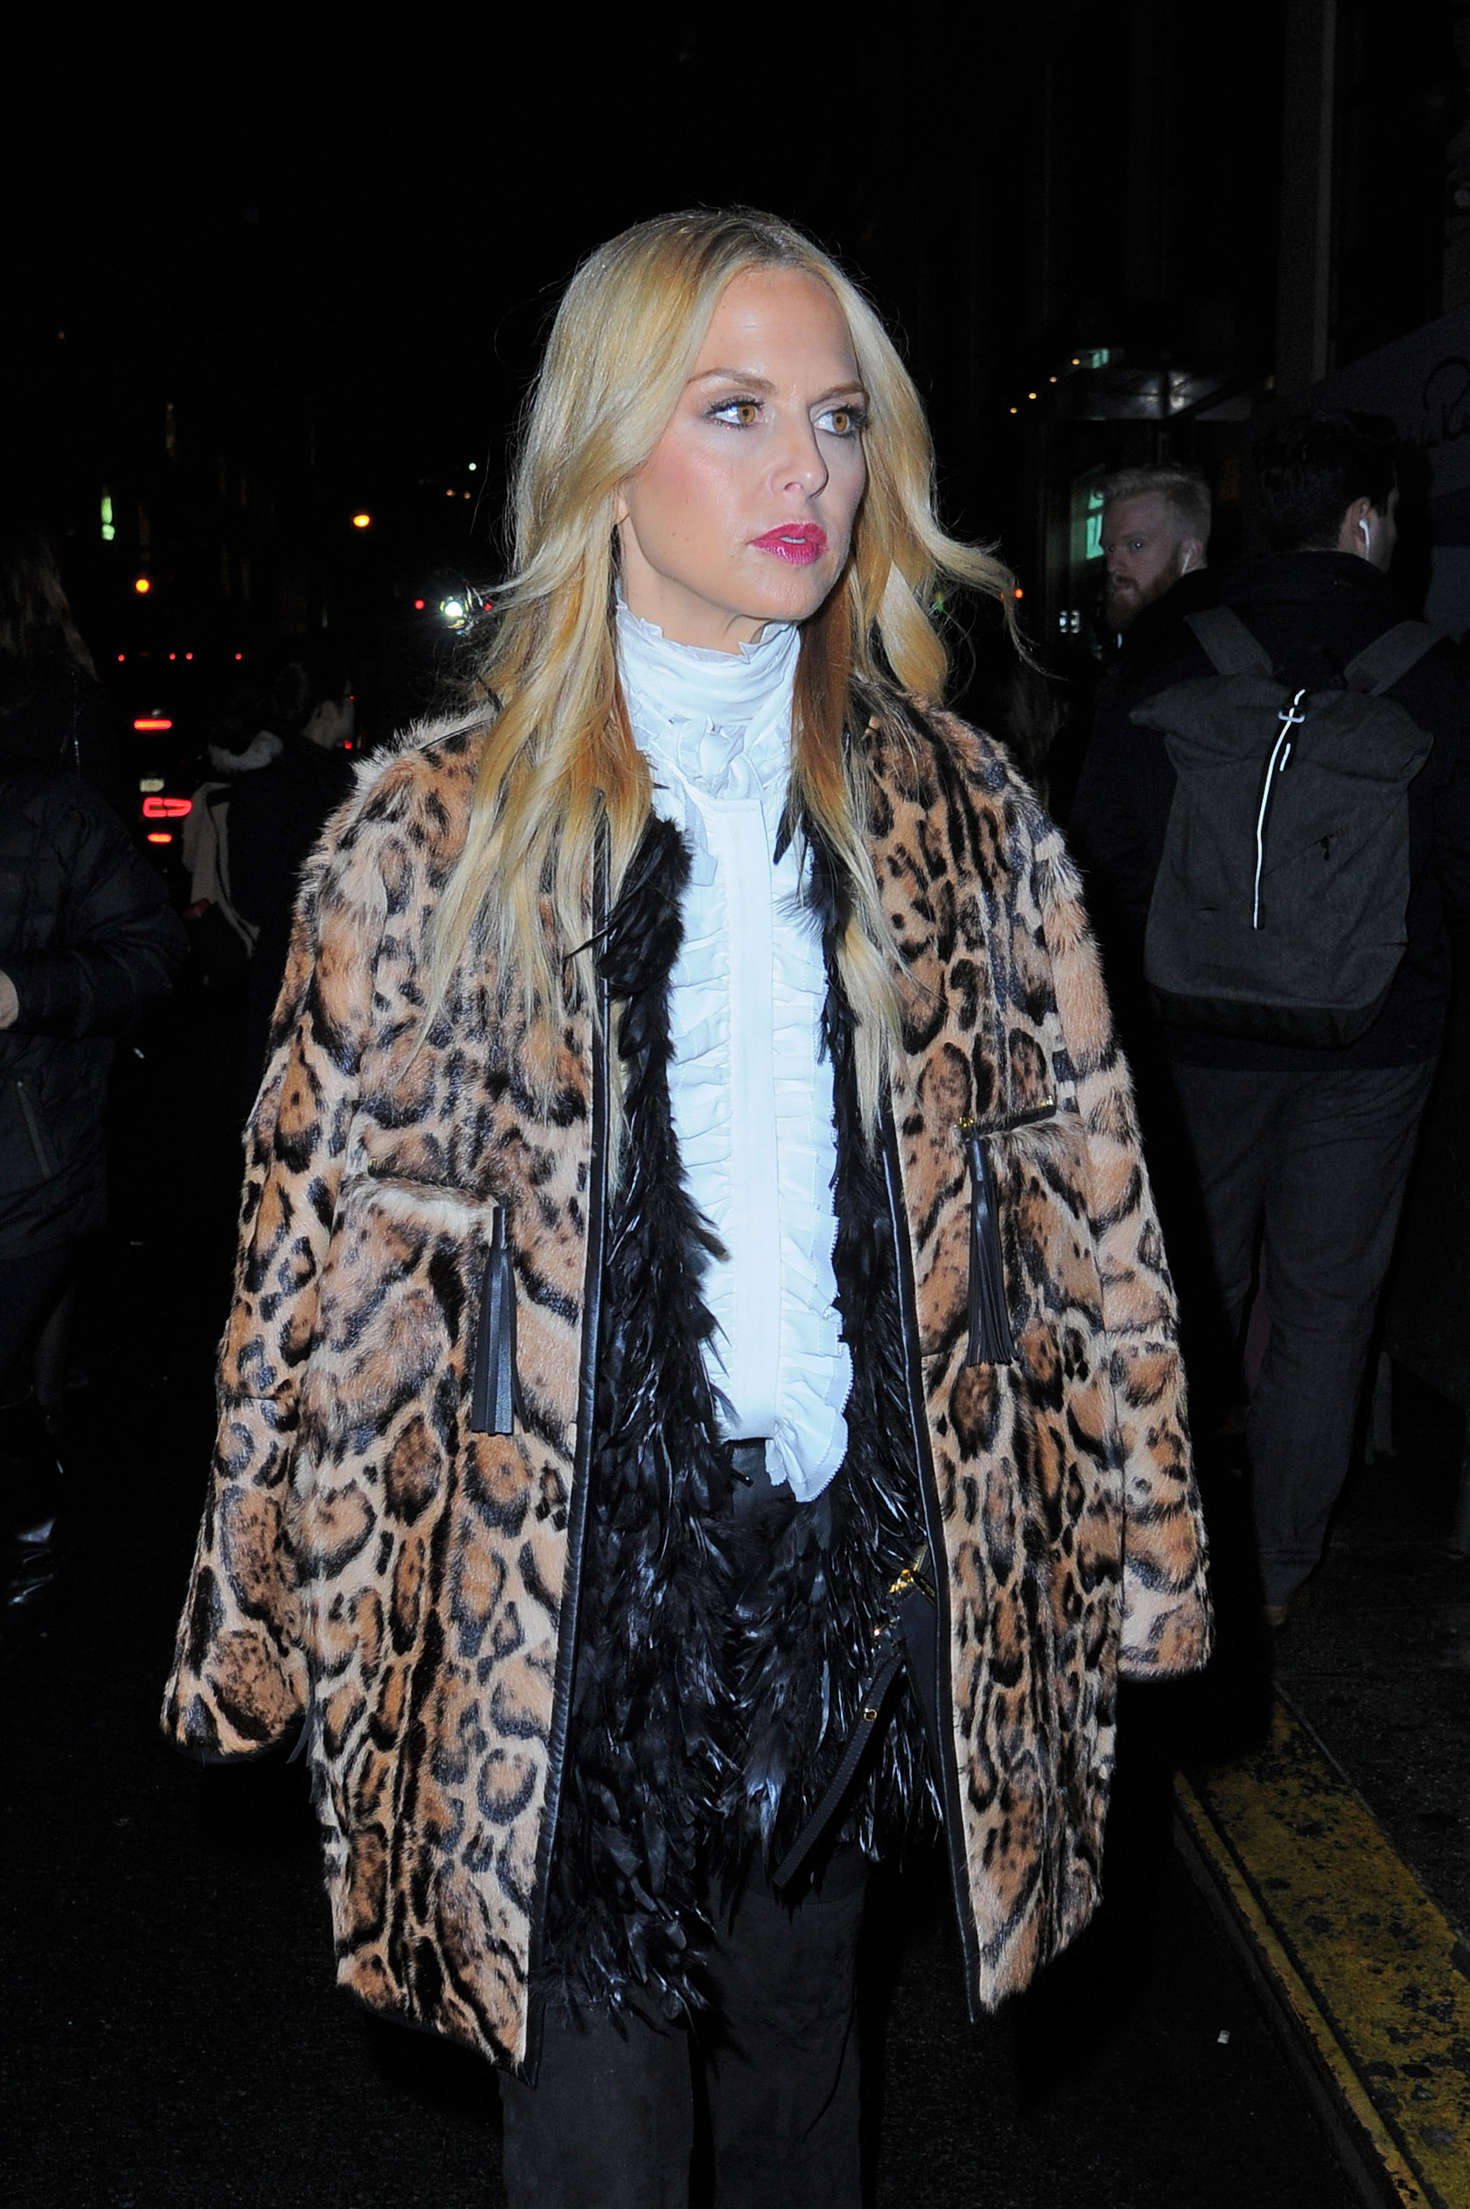 Rachel zoe at oscar de la renta fashion show in new york new images